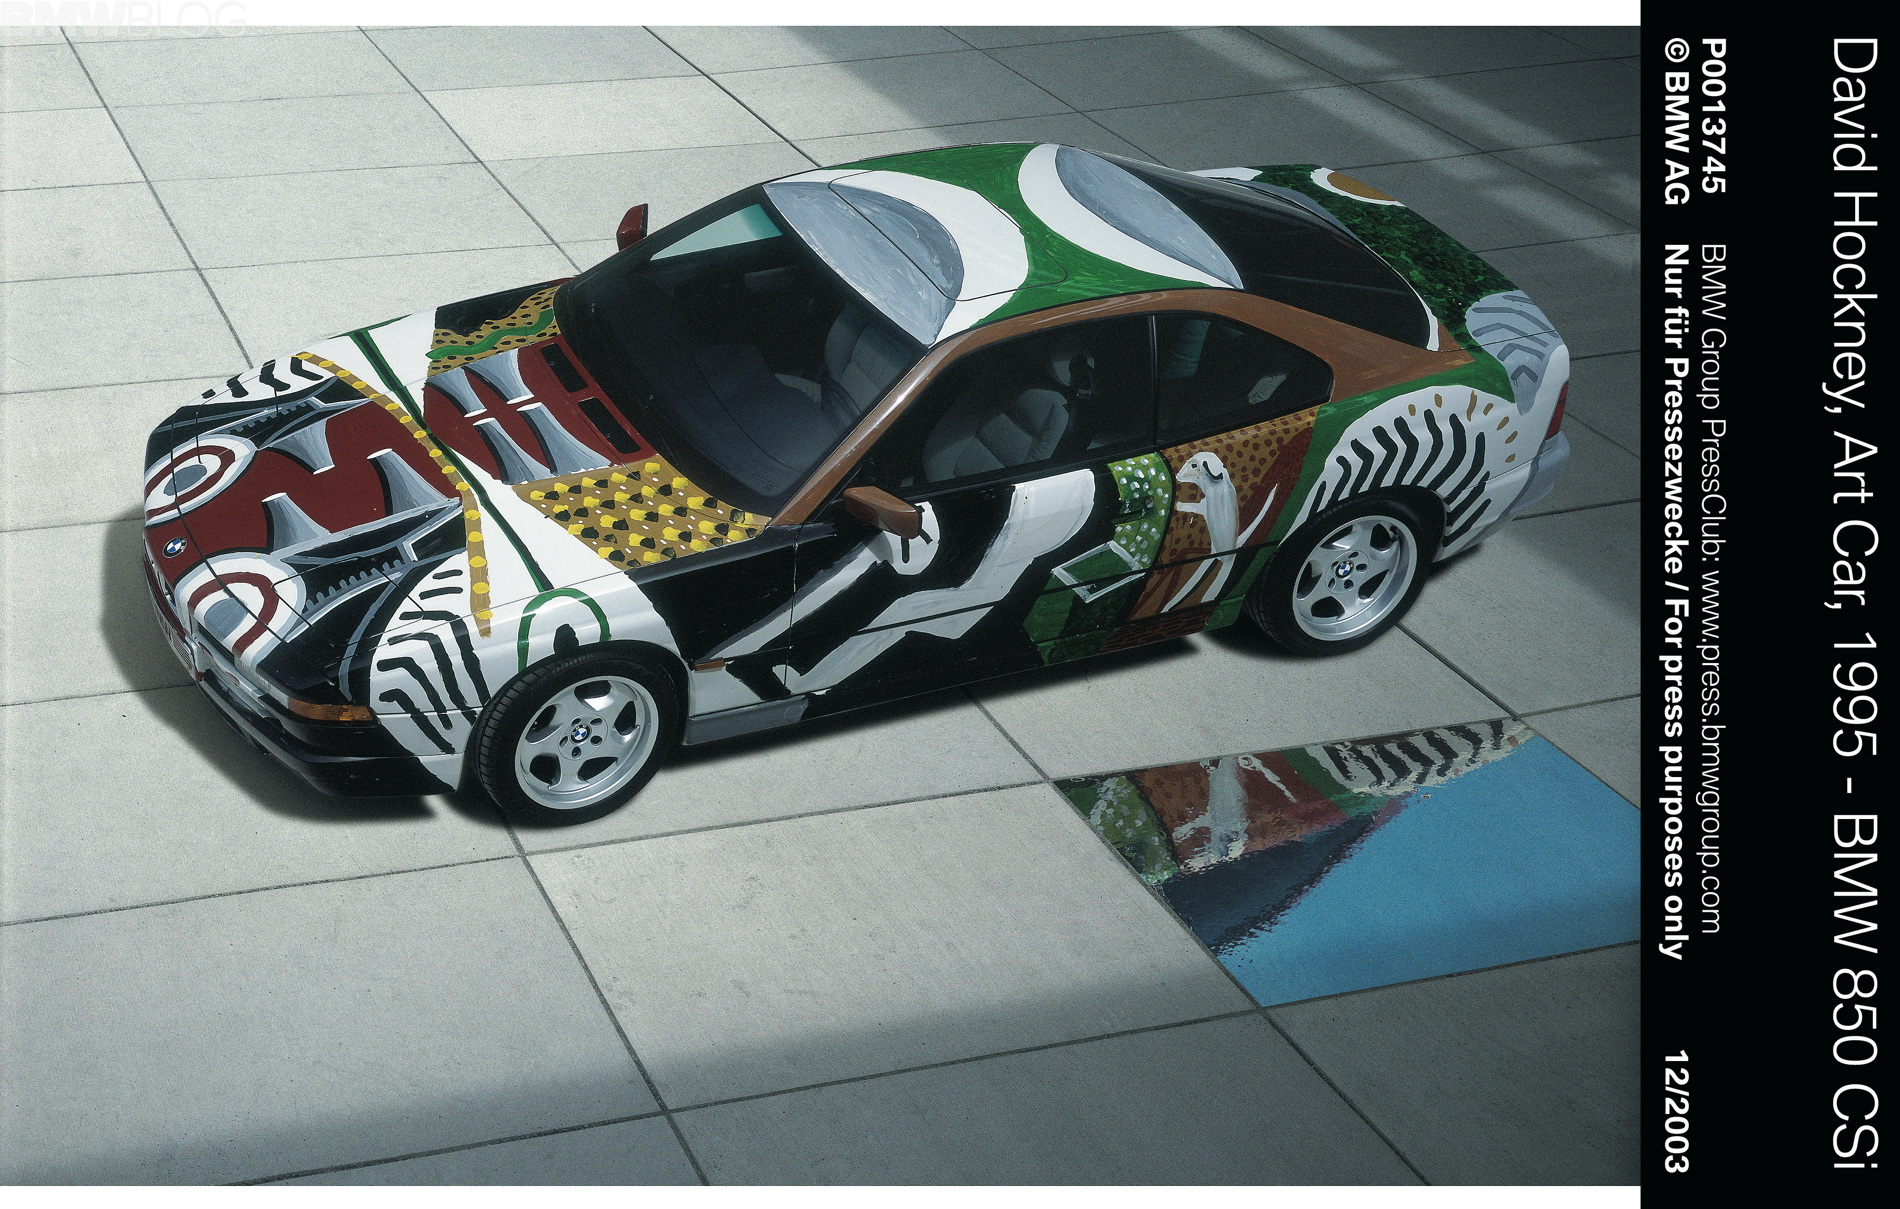 David Hockney's BMW Art Car 02